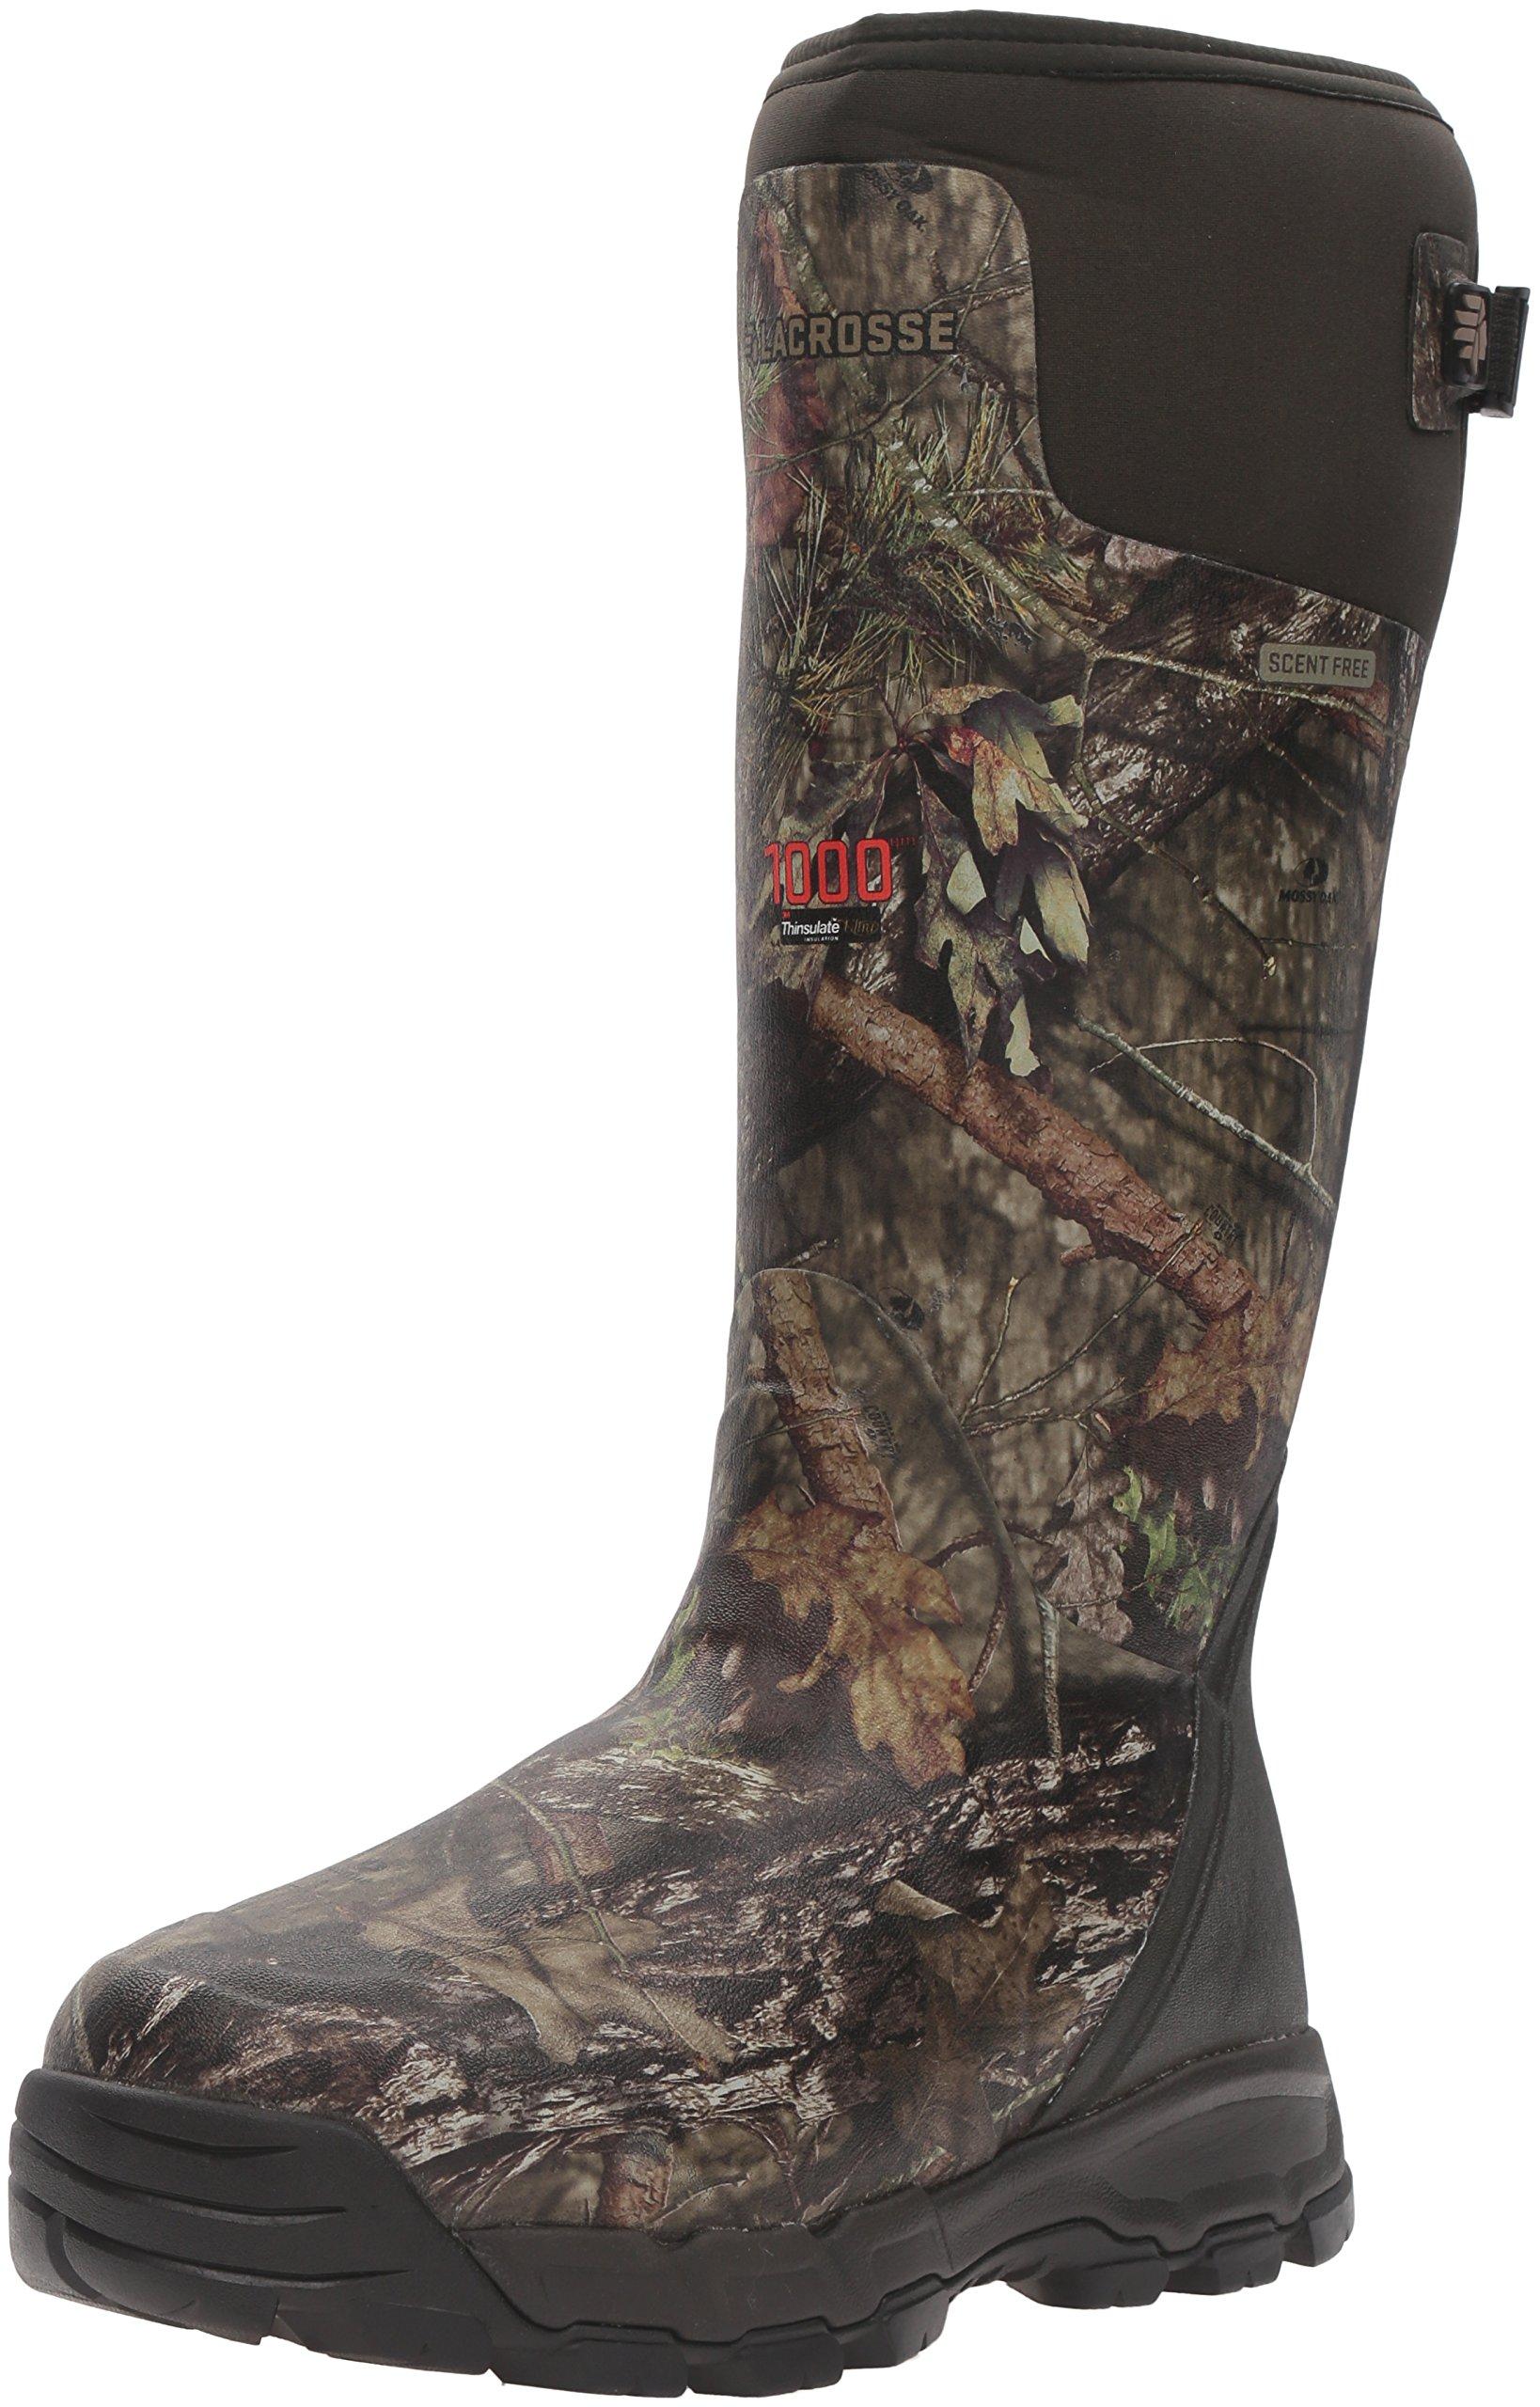 LaCrosse Men's Alphaburly Pro 18'' 1000G Hunting Shoes, Mossy Oak Break Up Country, 12 M US